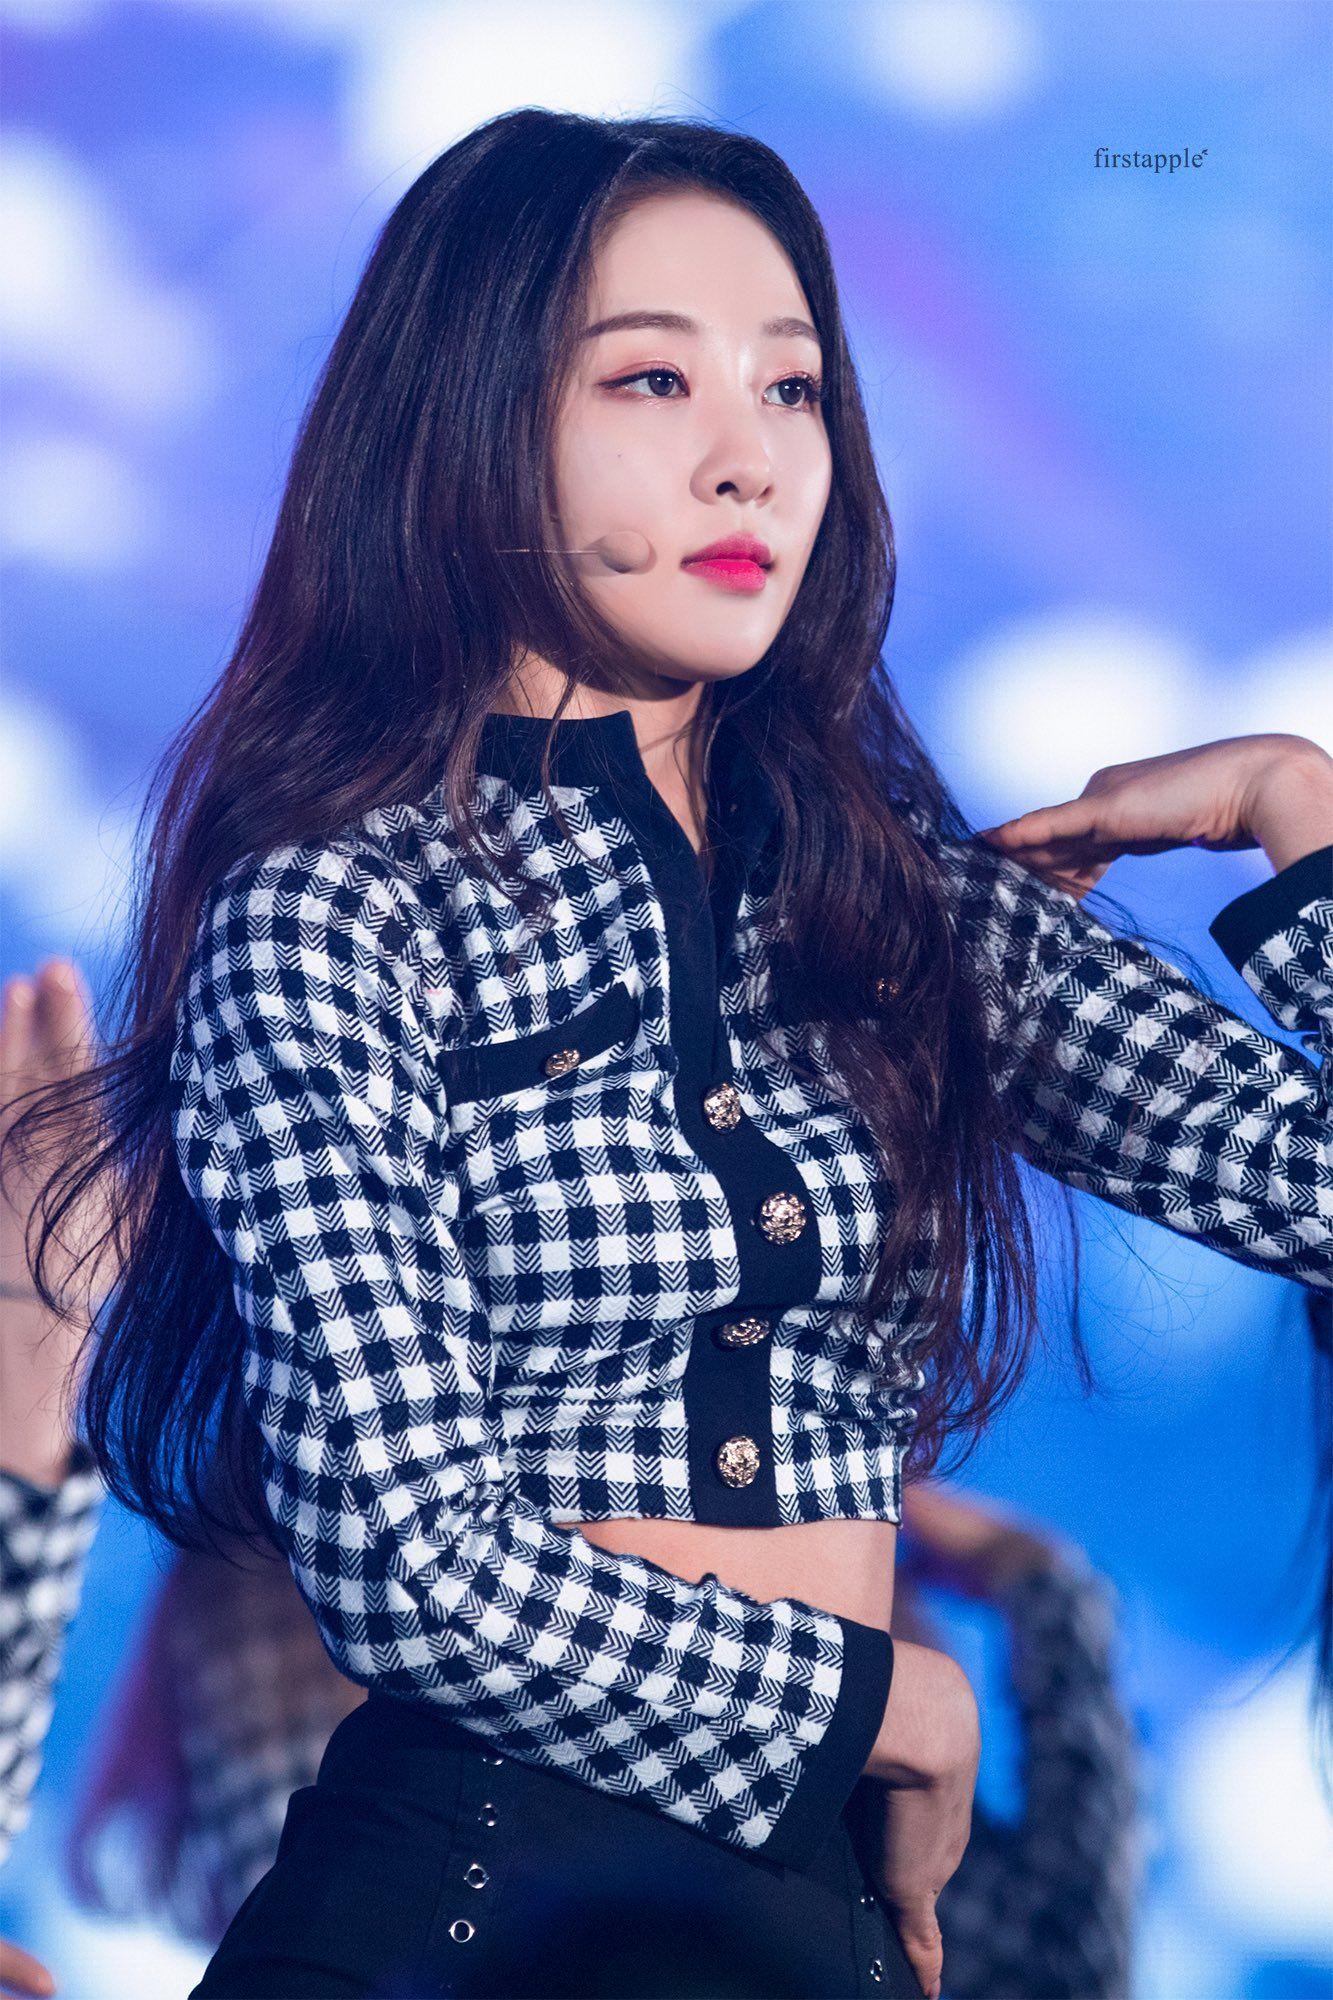 ғɪʀsᴛᴀᴘᴘʟᴇ On Twitter Kpop Girls Cool Girl Girl